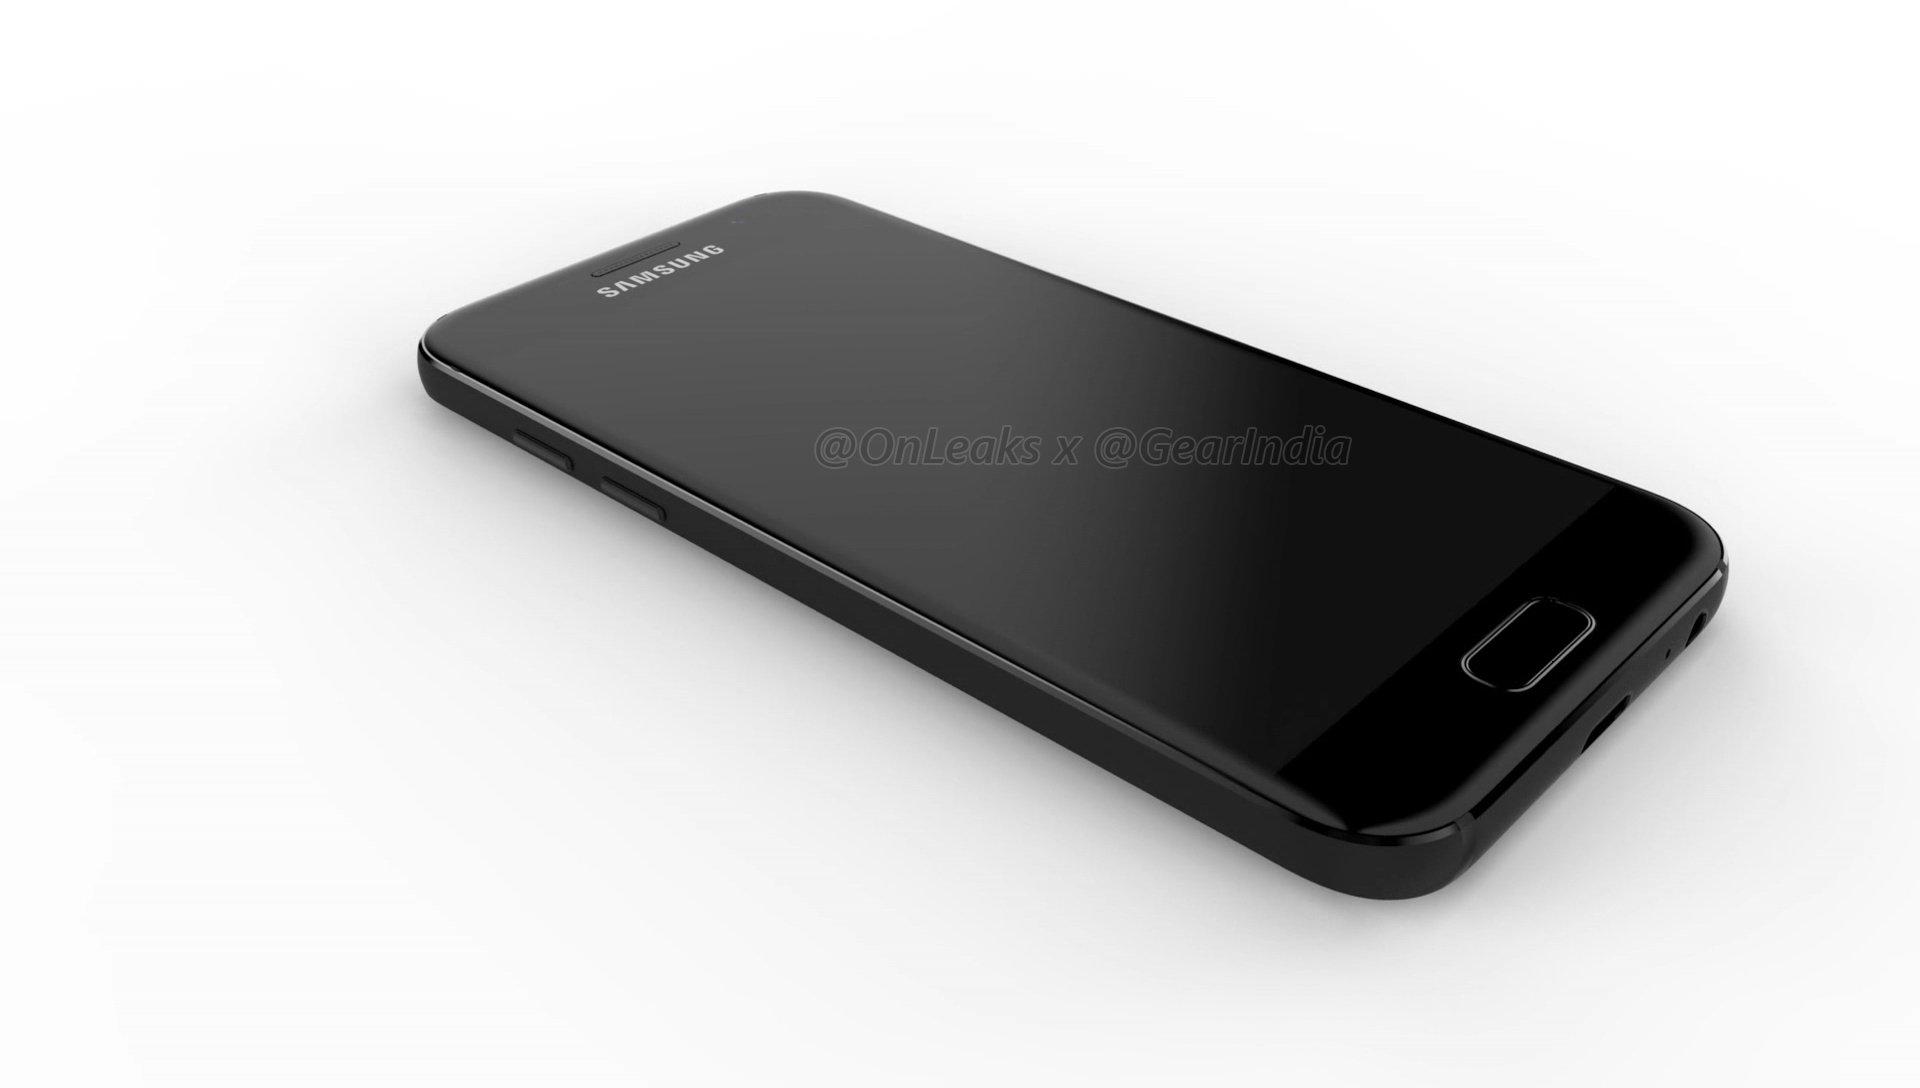 Samsung Galaxy S8, fotocamera anteriore con autofocus? Forse anche speaker Harman Kardon